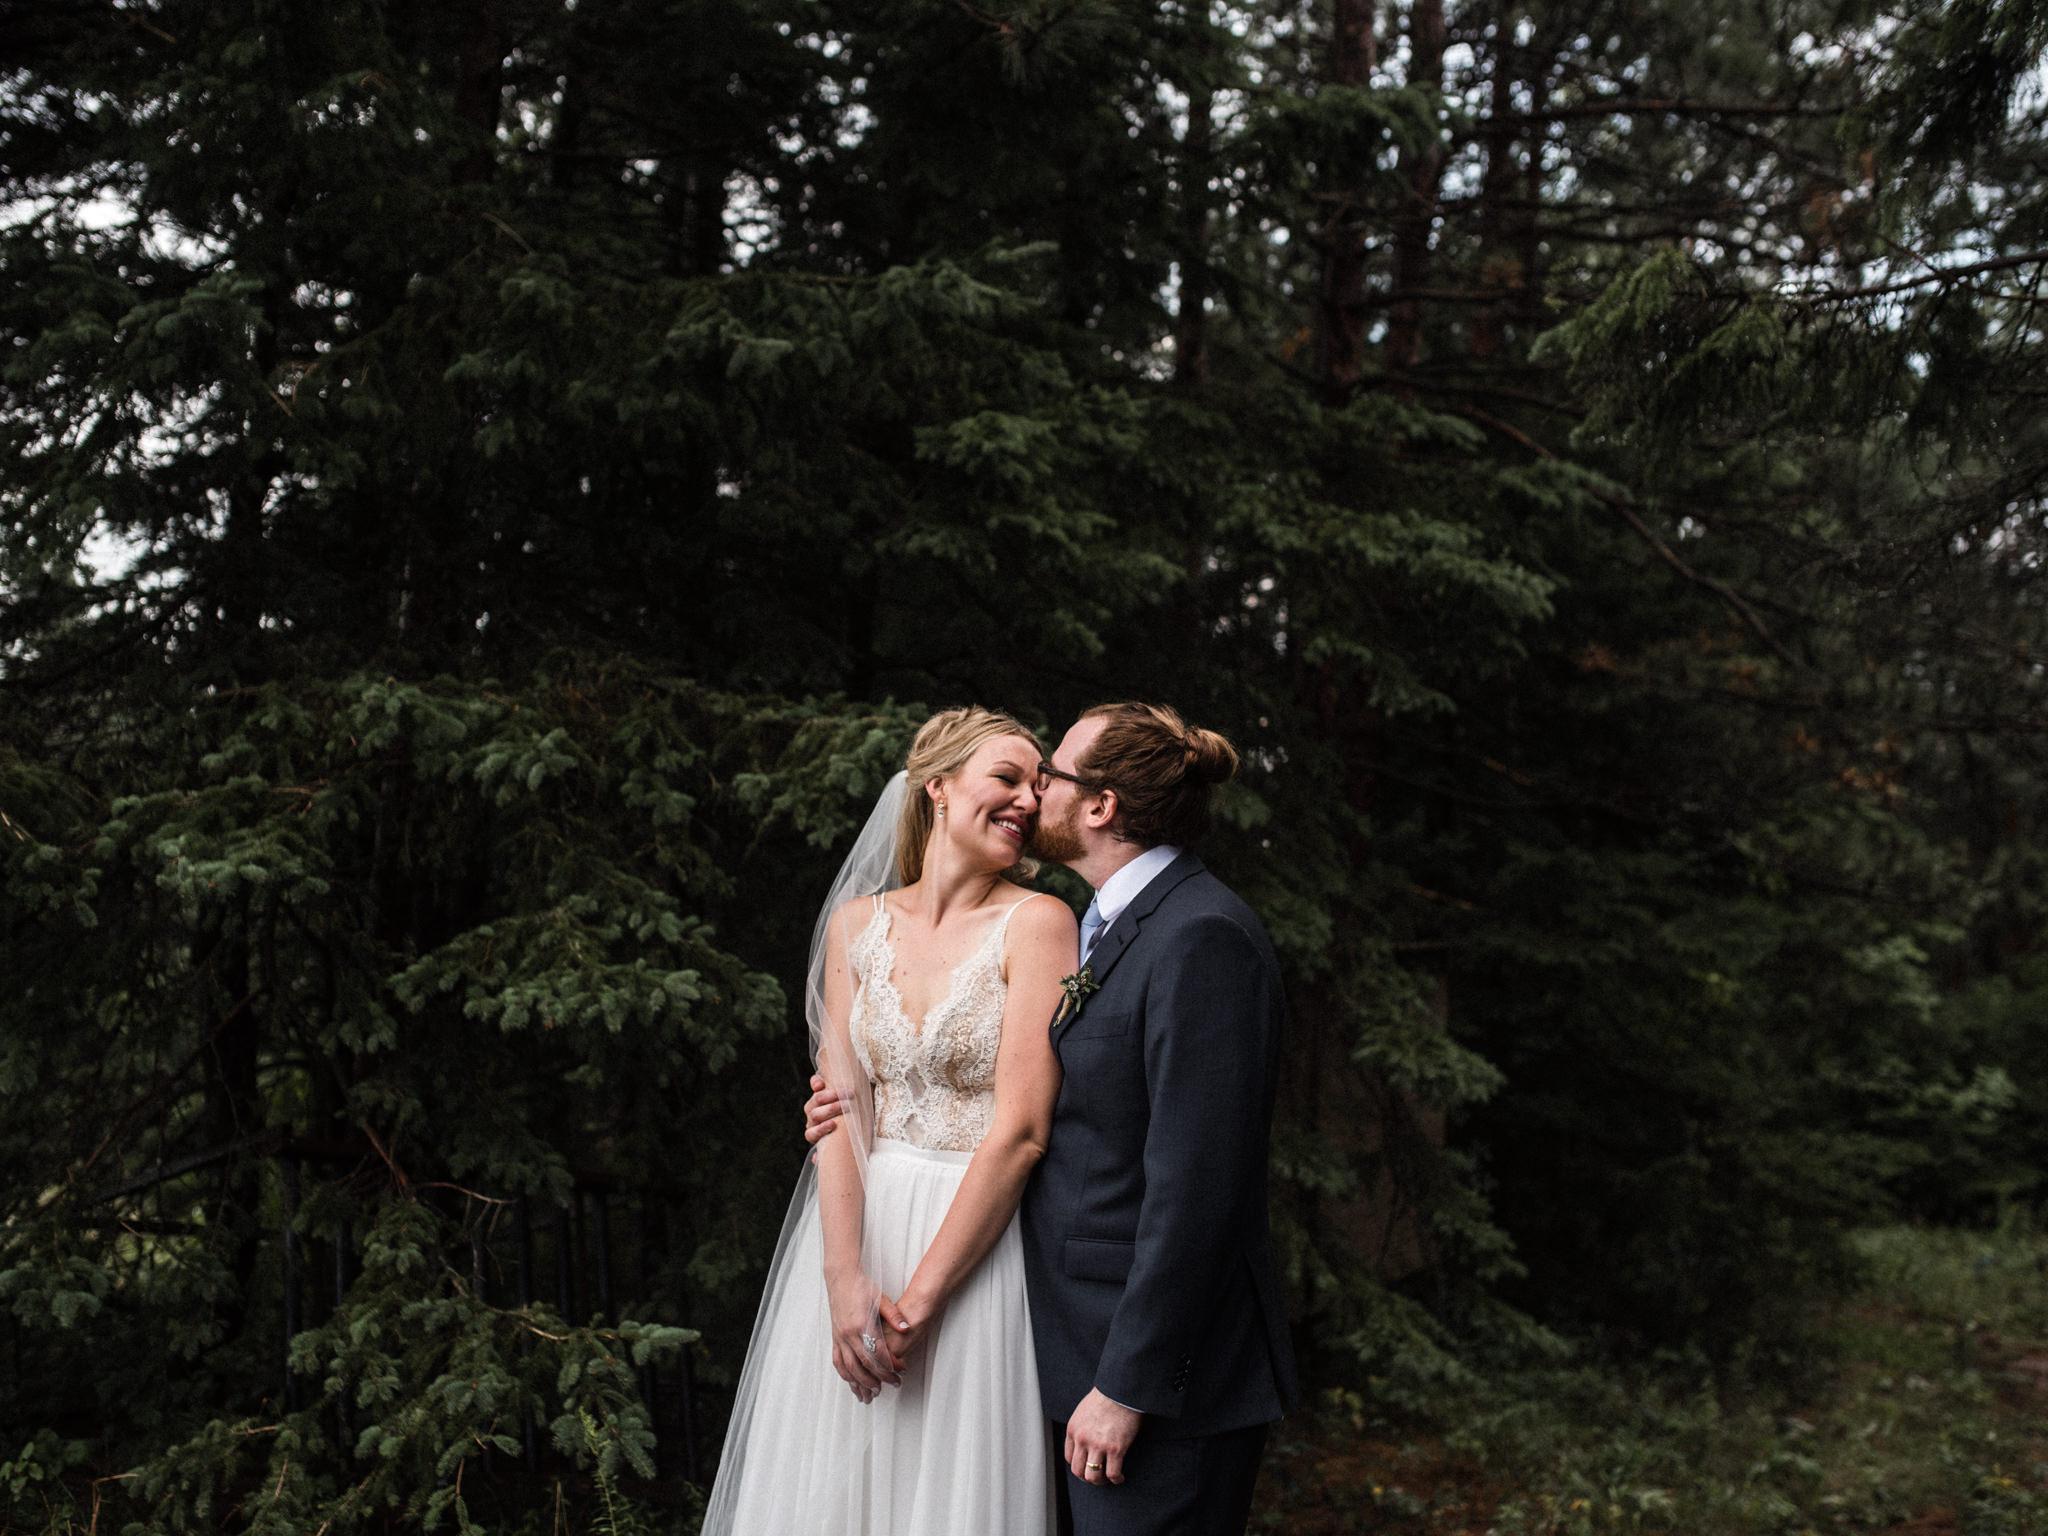 skyloft-wedding-toronto-wedding-photographer-46.jpg